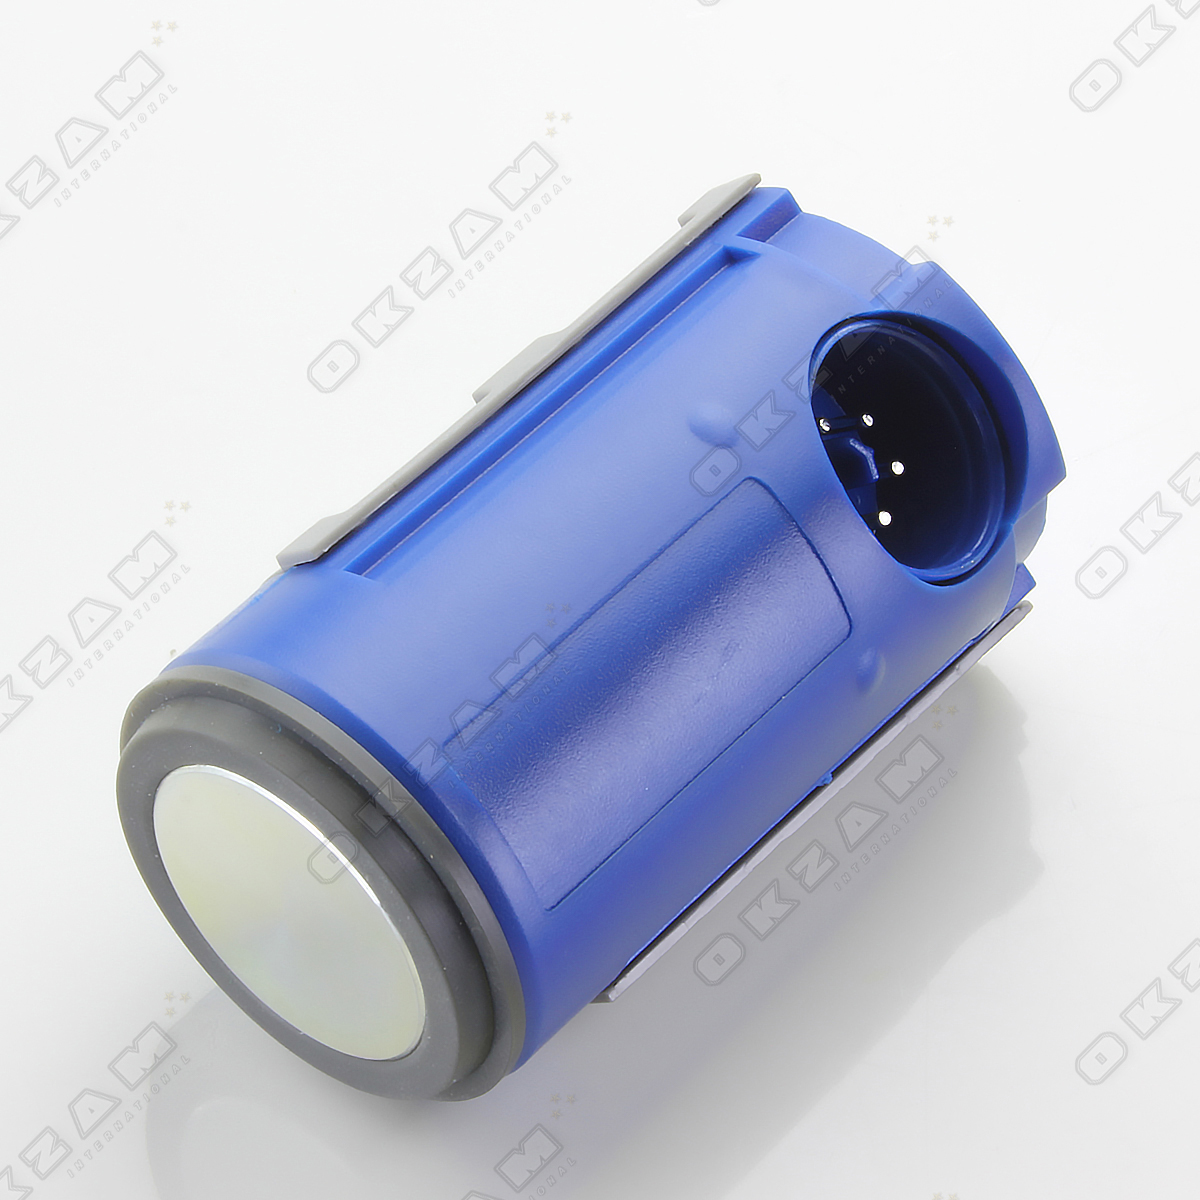 1x Pdc Parking Sensor Rear For Mercedes Vito 638